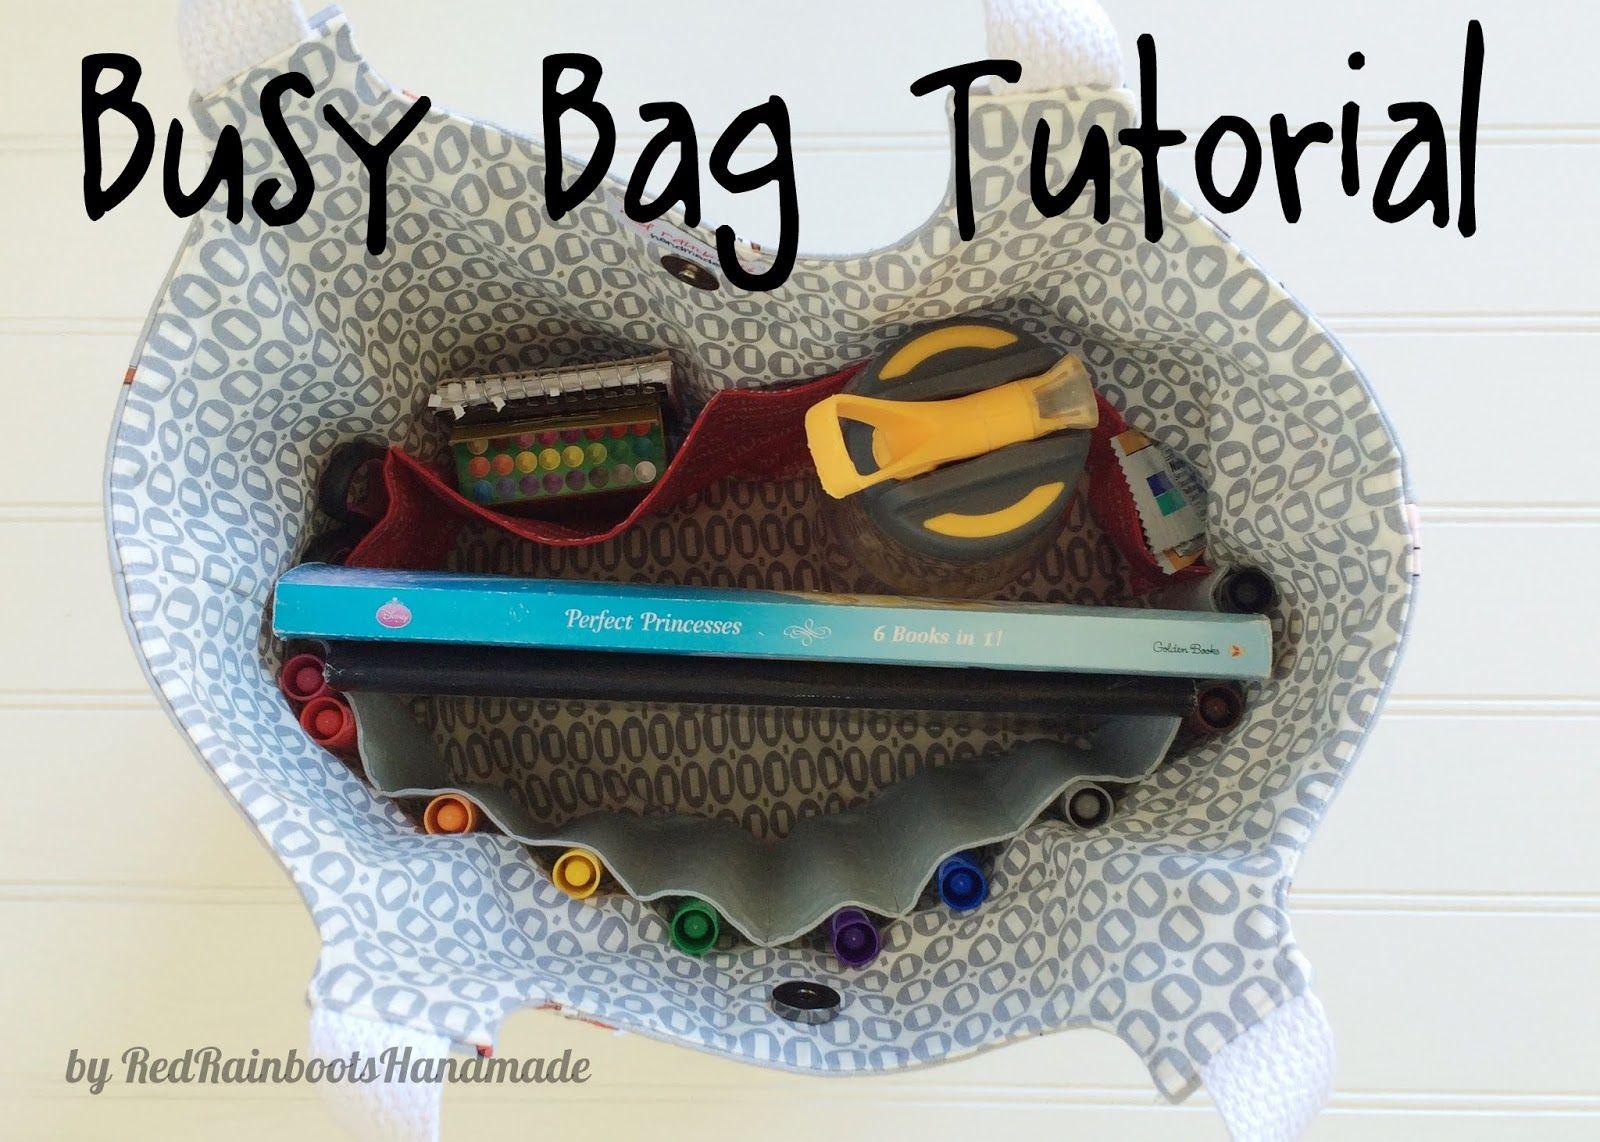 Busy Bag Tutorial - free from RedRainbootsHandmade